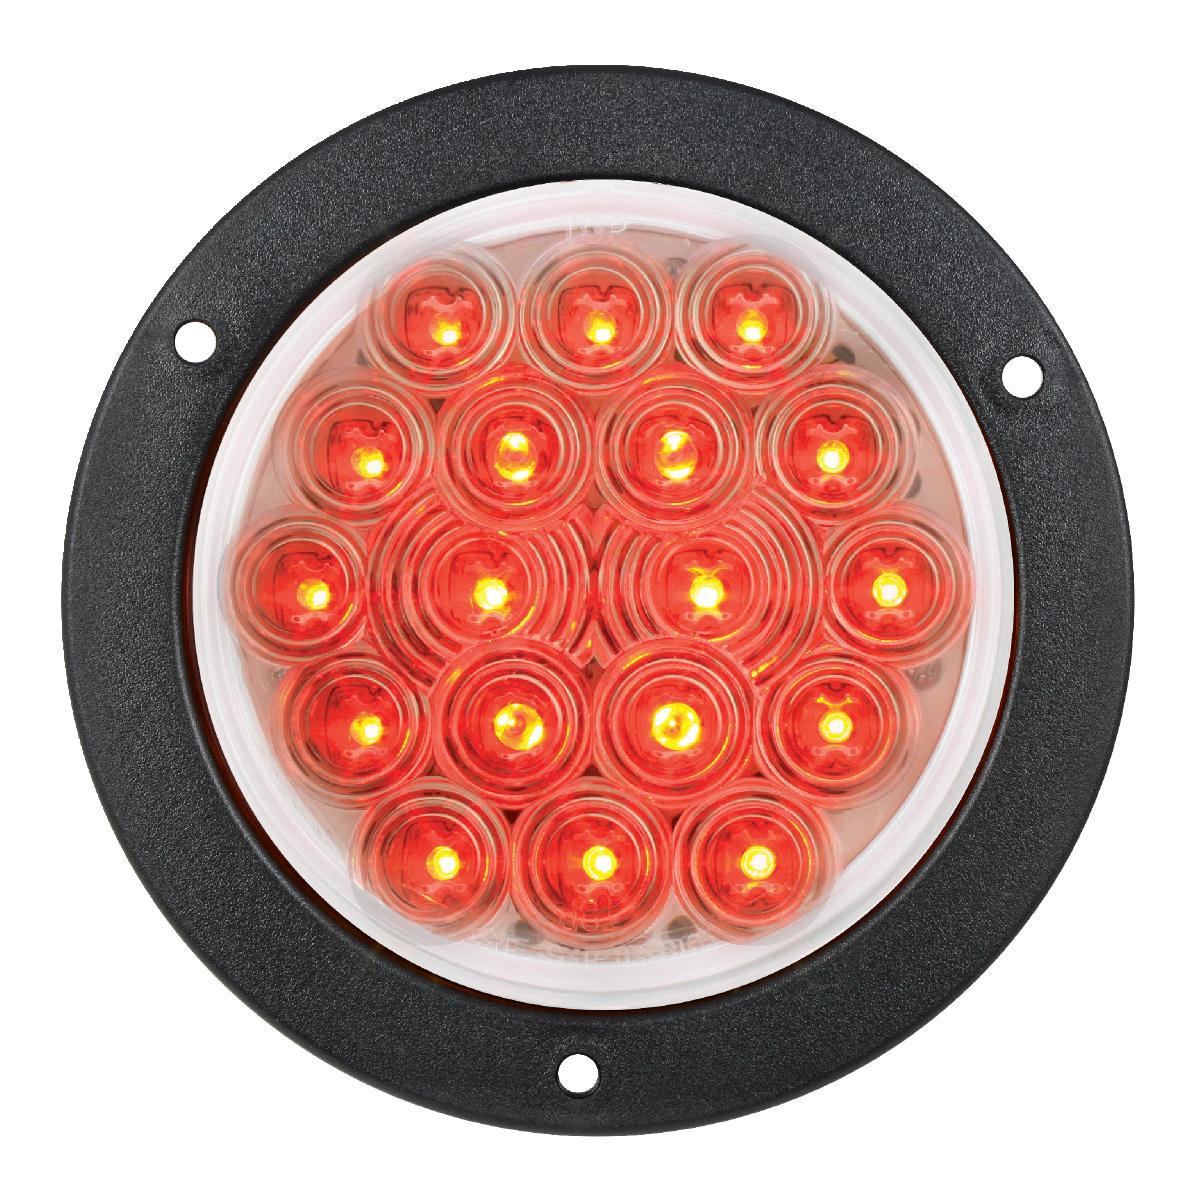 "75893 4"" Fleet LED Light with Black Flange Mount in 3 Wires"